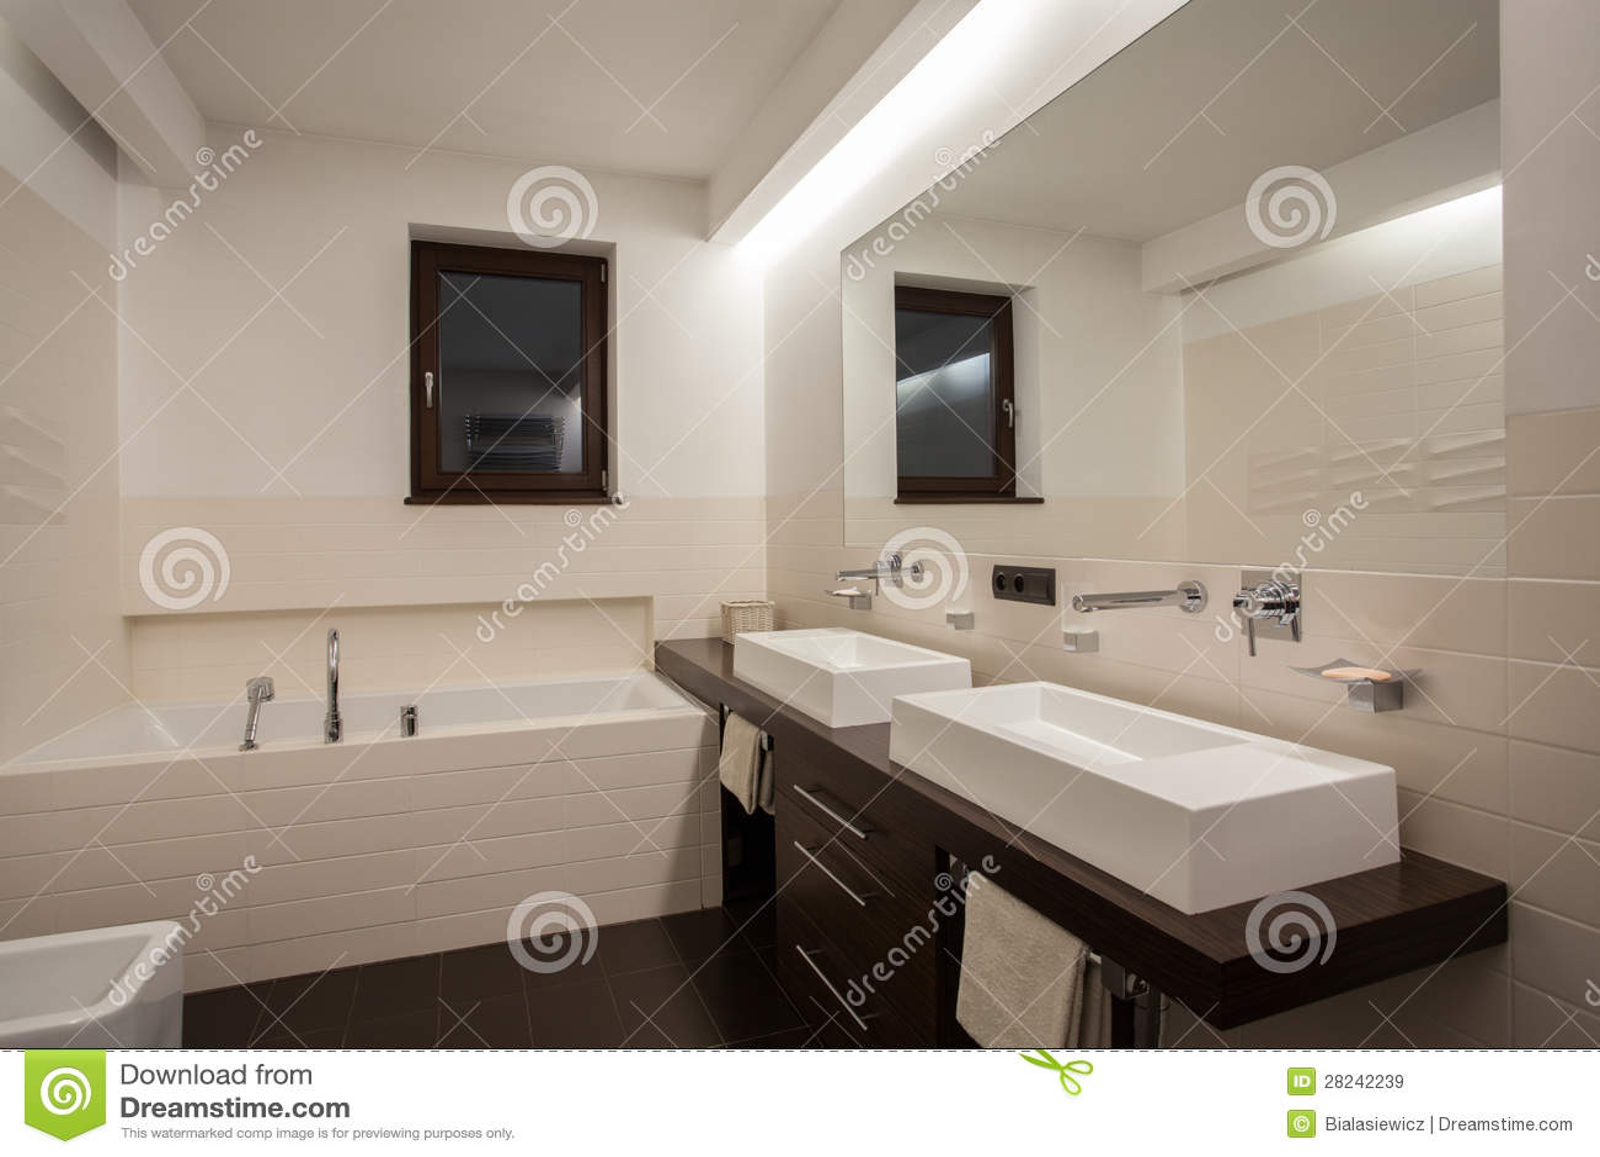 travertine house modern bathroom stock image image 28242239. Black Bedroom Furniture Sets. Home Design Ideas